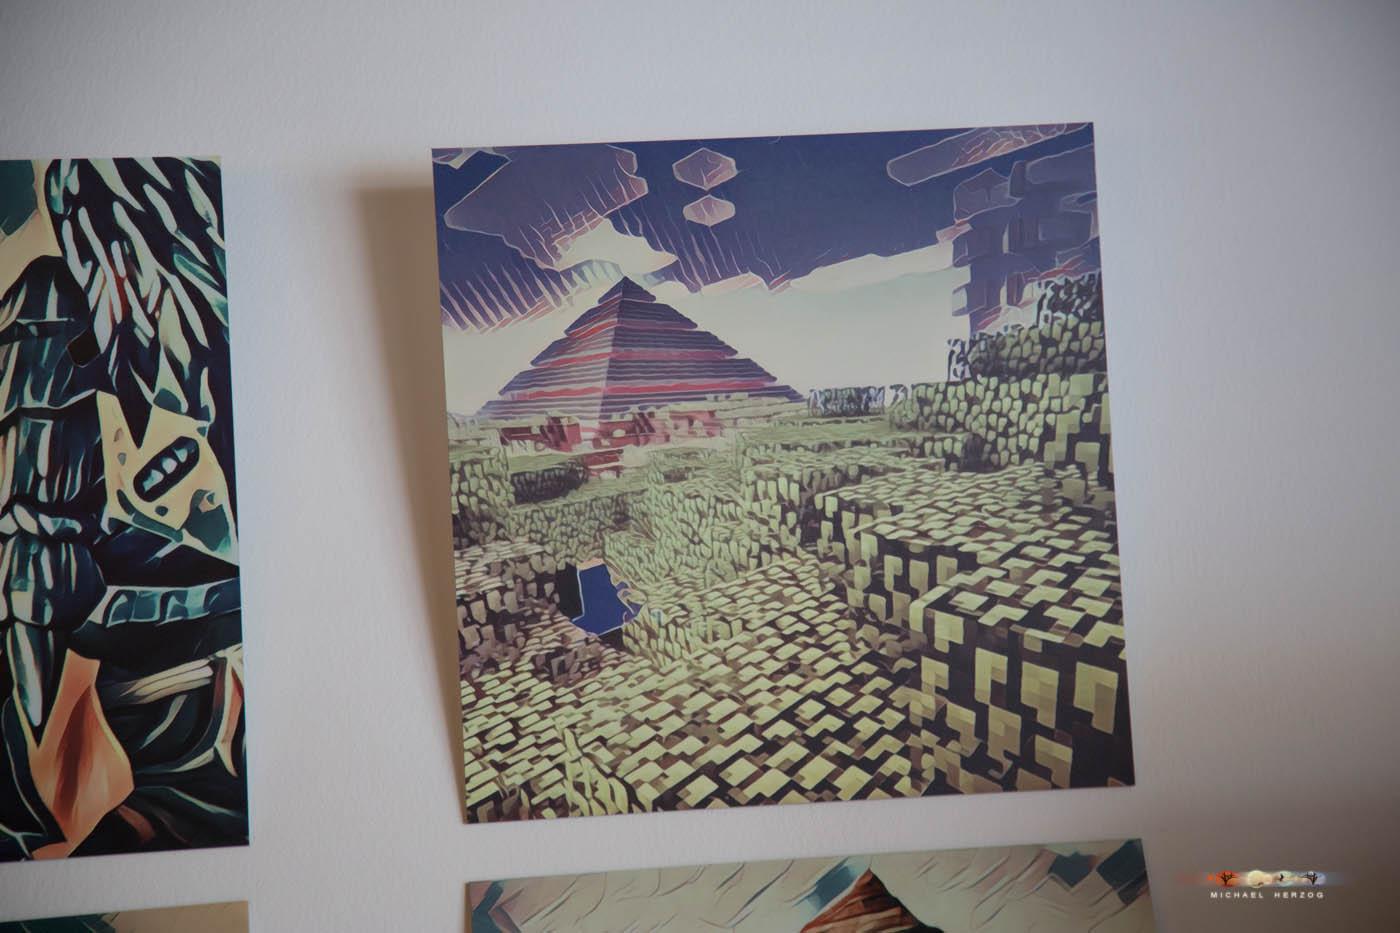 ARTquadrat216_Pyramide_GameSeries_MichaelHerzog-6715.jpg